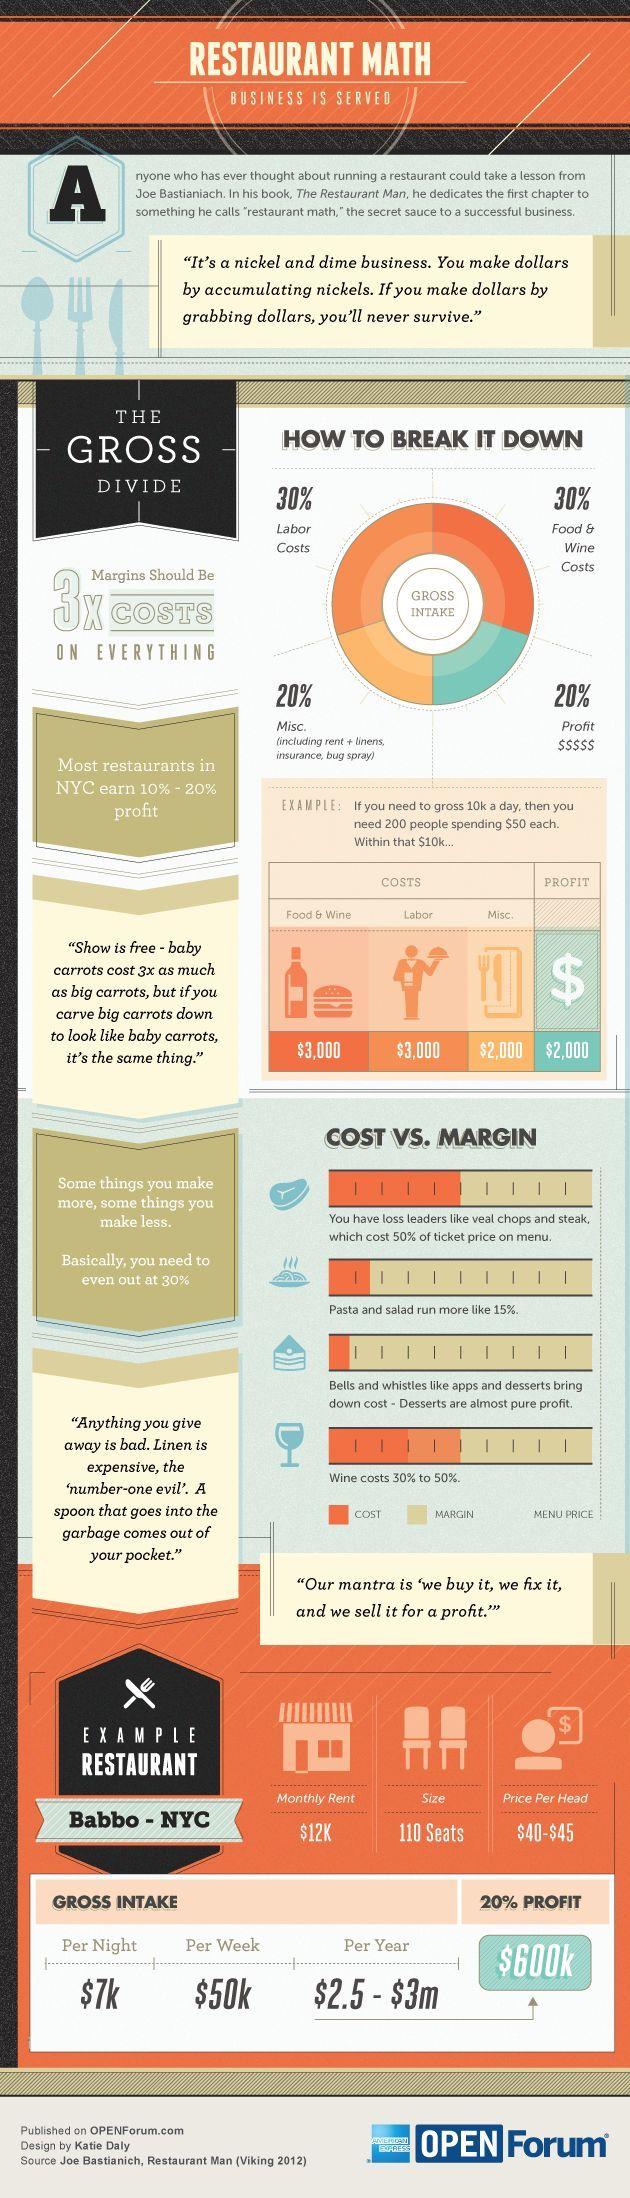 Average Restaurant Profit Margin and Restaurant Operating Expenses